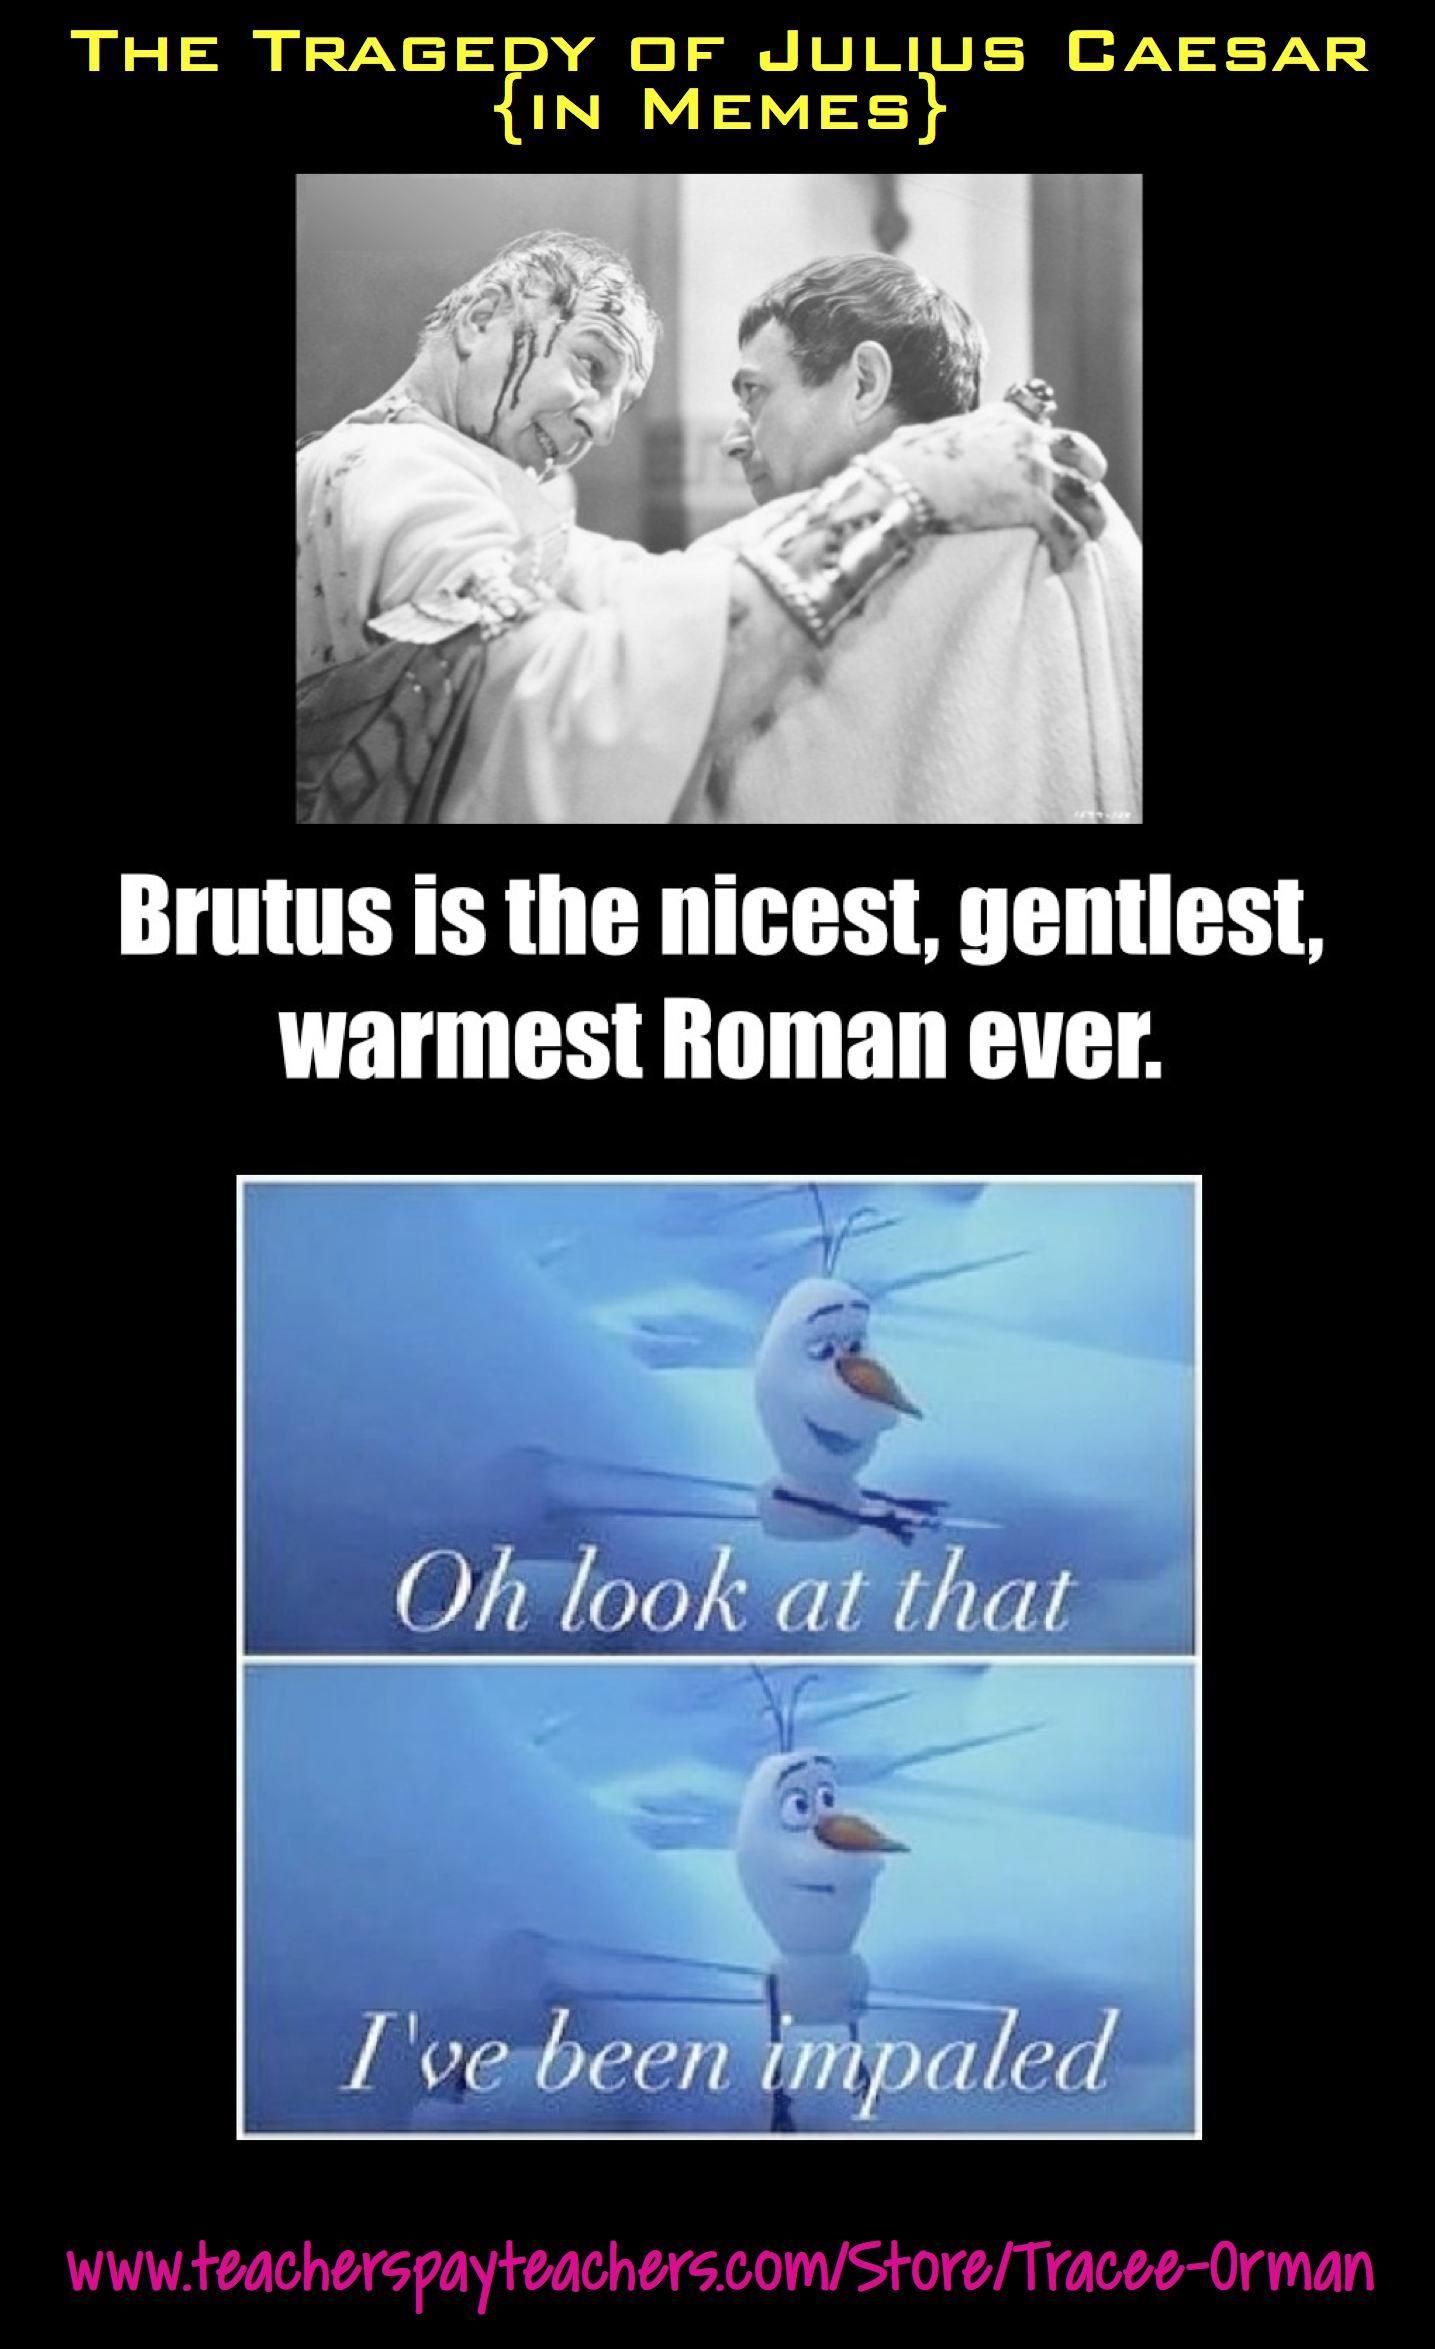 Shakespeare In Memes Tragedy Of Julius Caesar